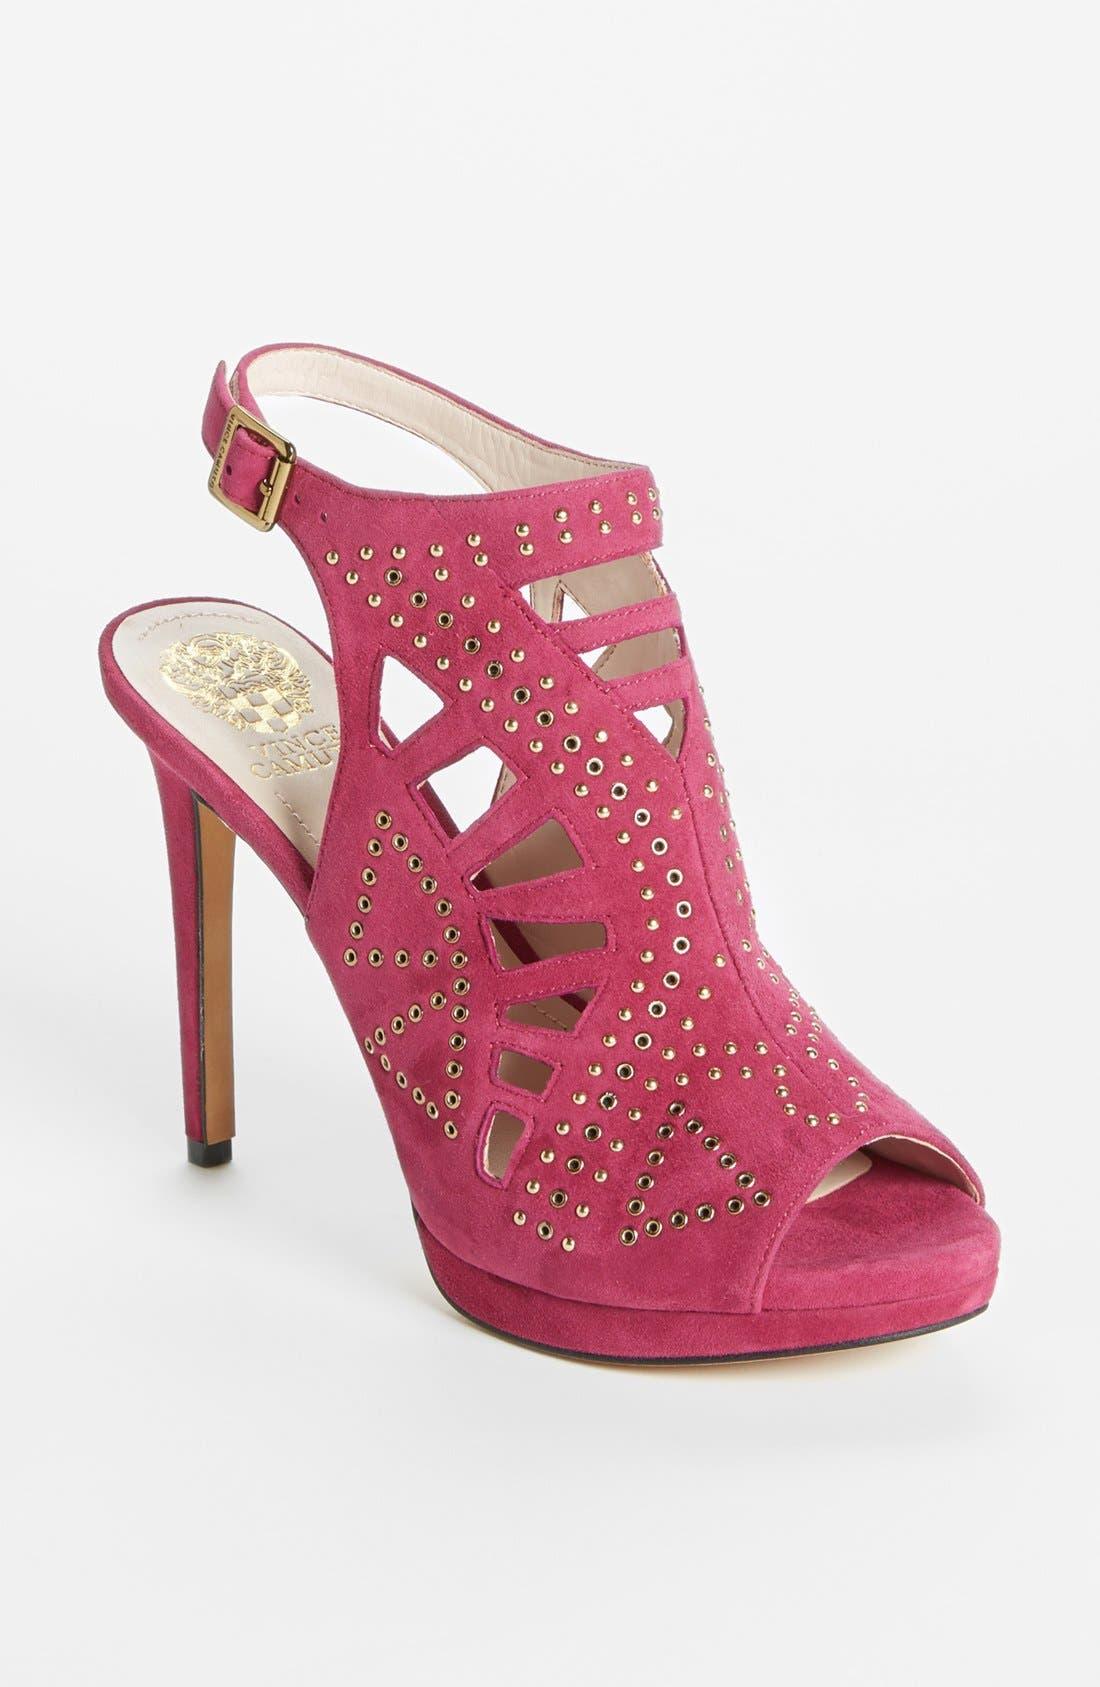 Alternate Image 1 Selected - Vince Camuto 'Cassi' Sandal